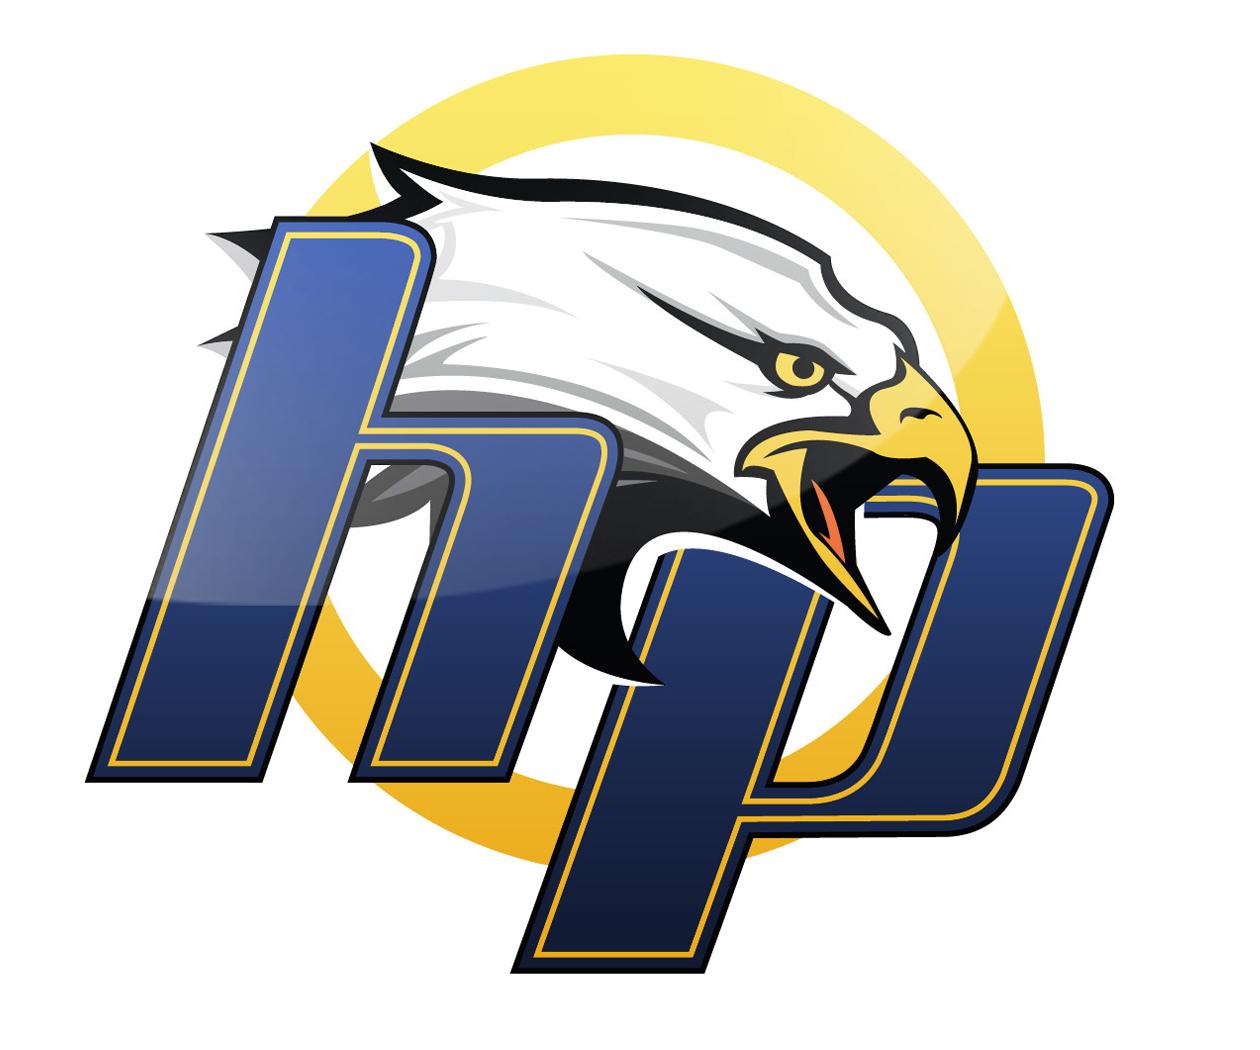 testimonial-for-the-custom-sports-logo-design-for-hp-academy-athletics-logo-by-jordan-fretz.jpg